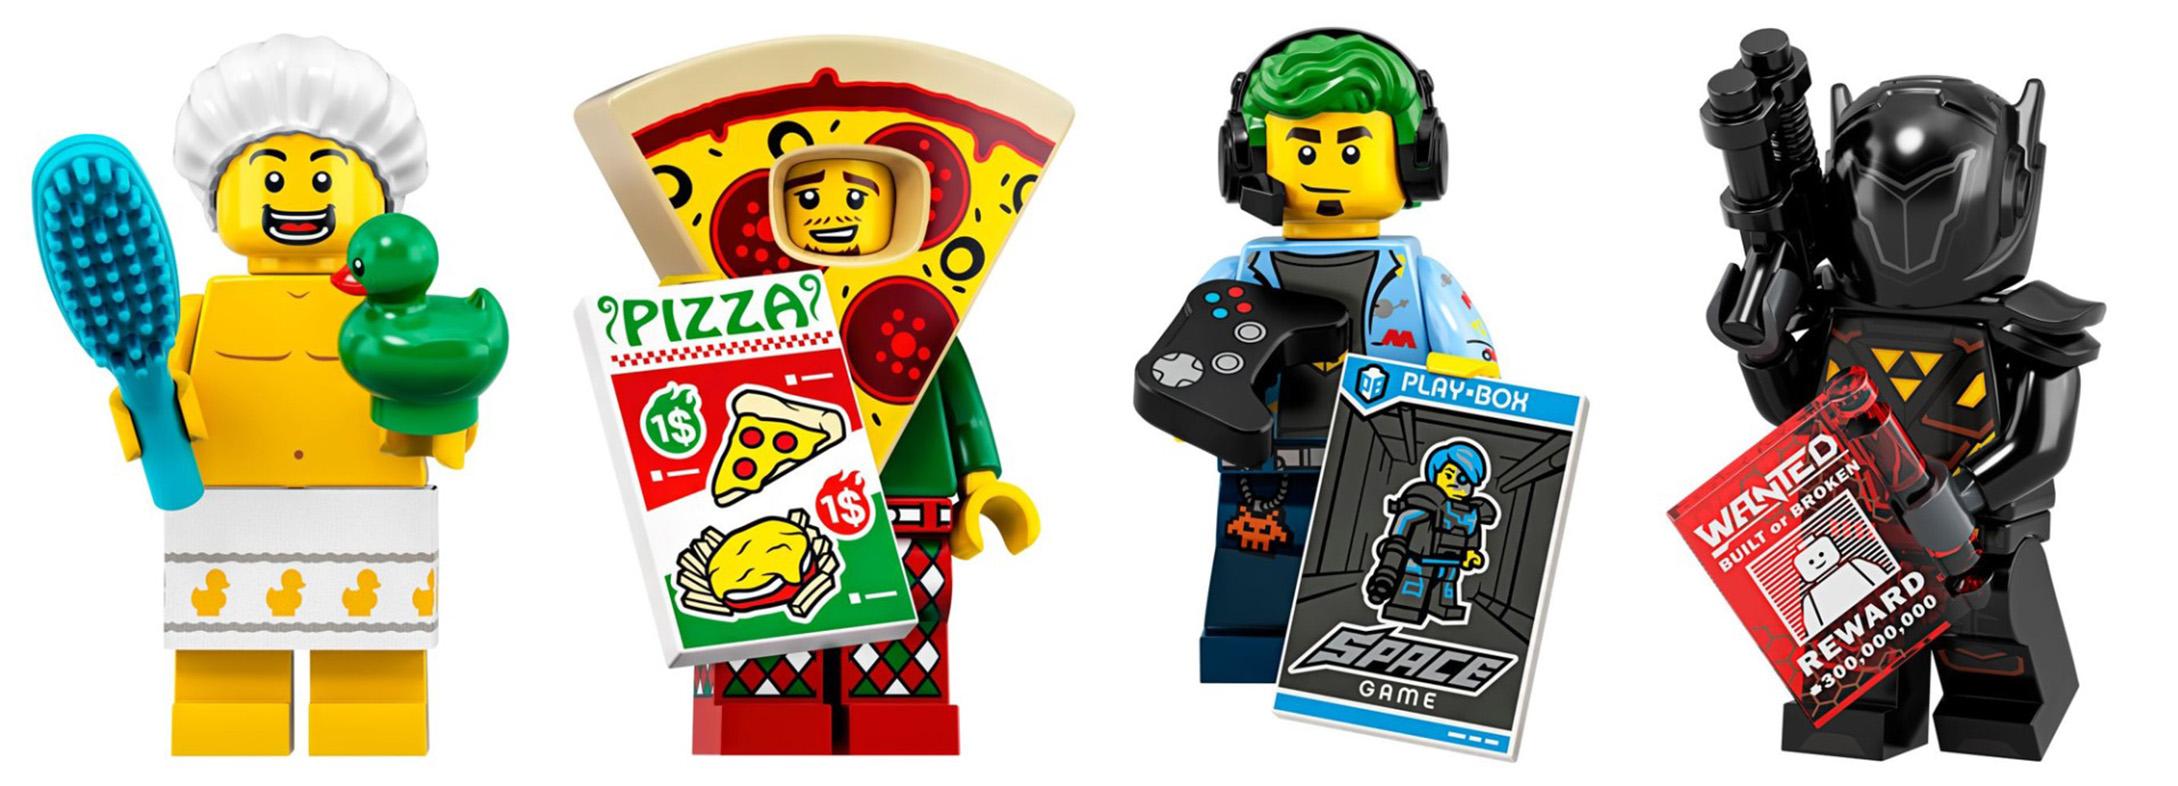 Little Boy no 2 Lego City Mini figure Black Hair Astronaut T-shirt